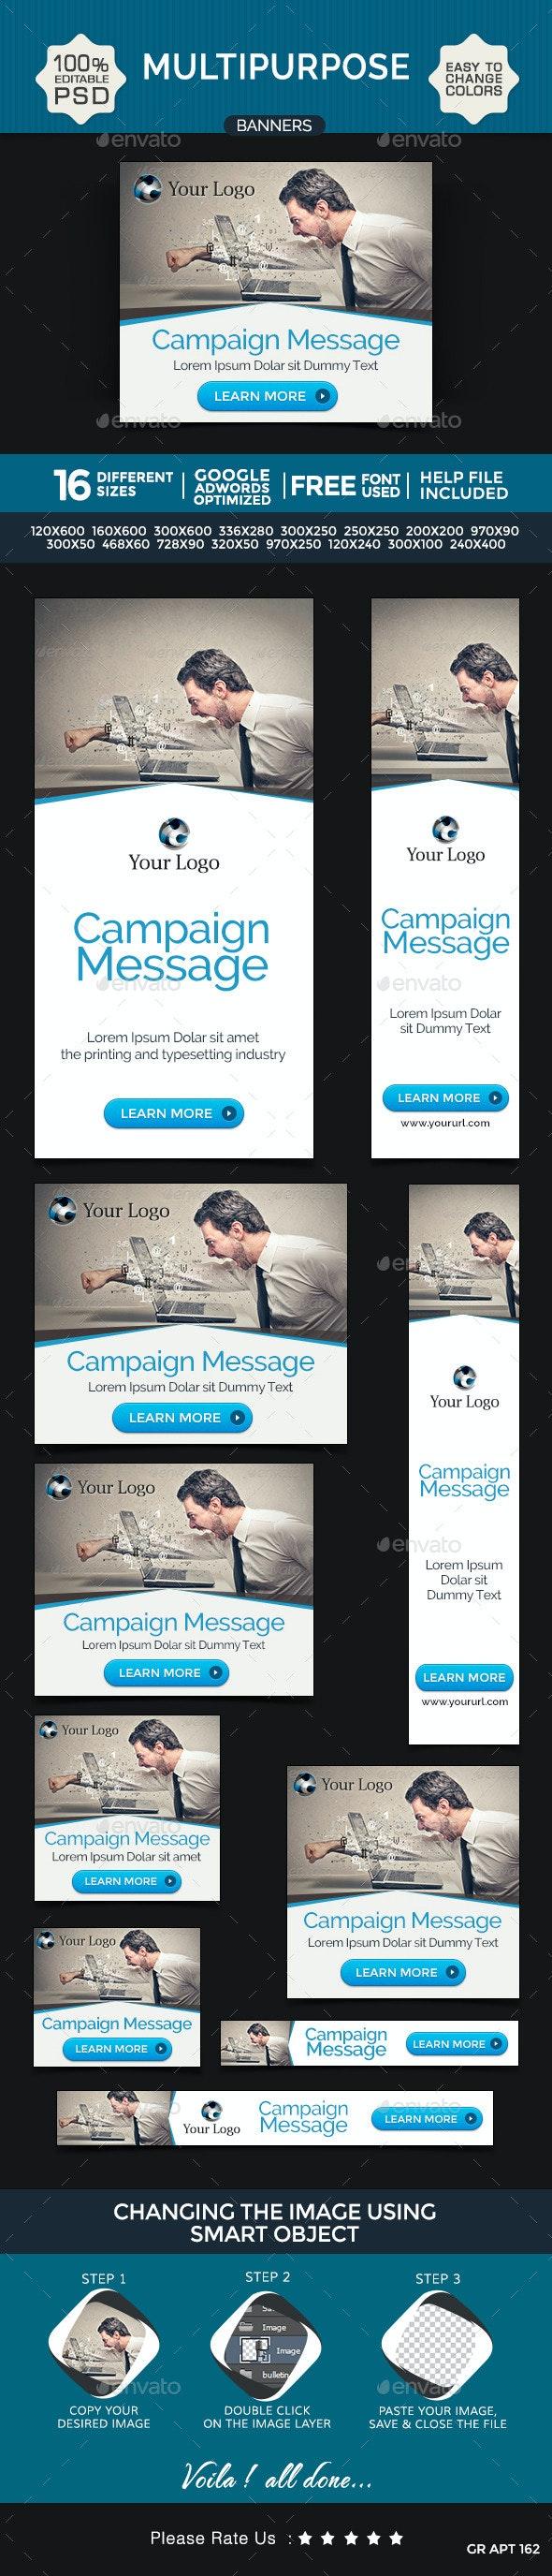 Multi Purpose Banner Design Set - Banners & Ads Web Elements